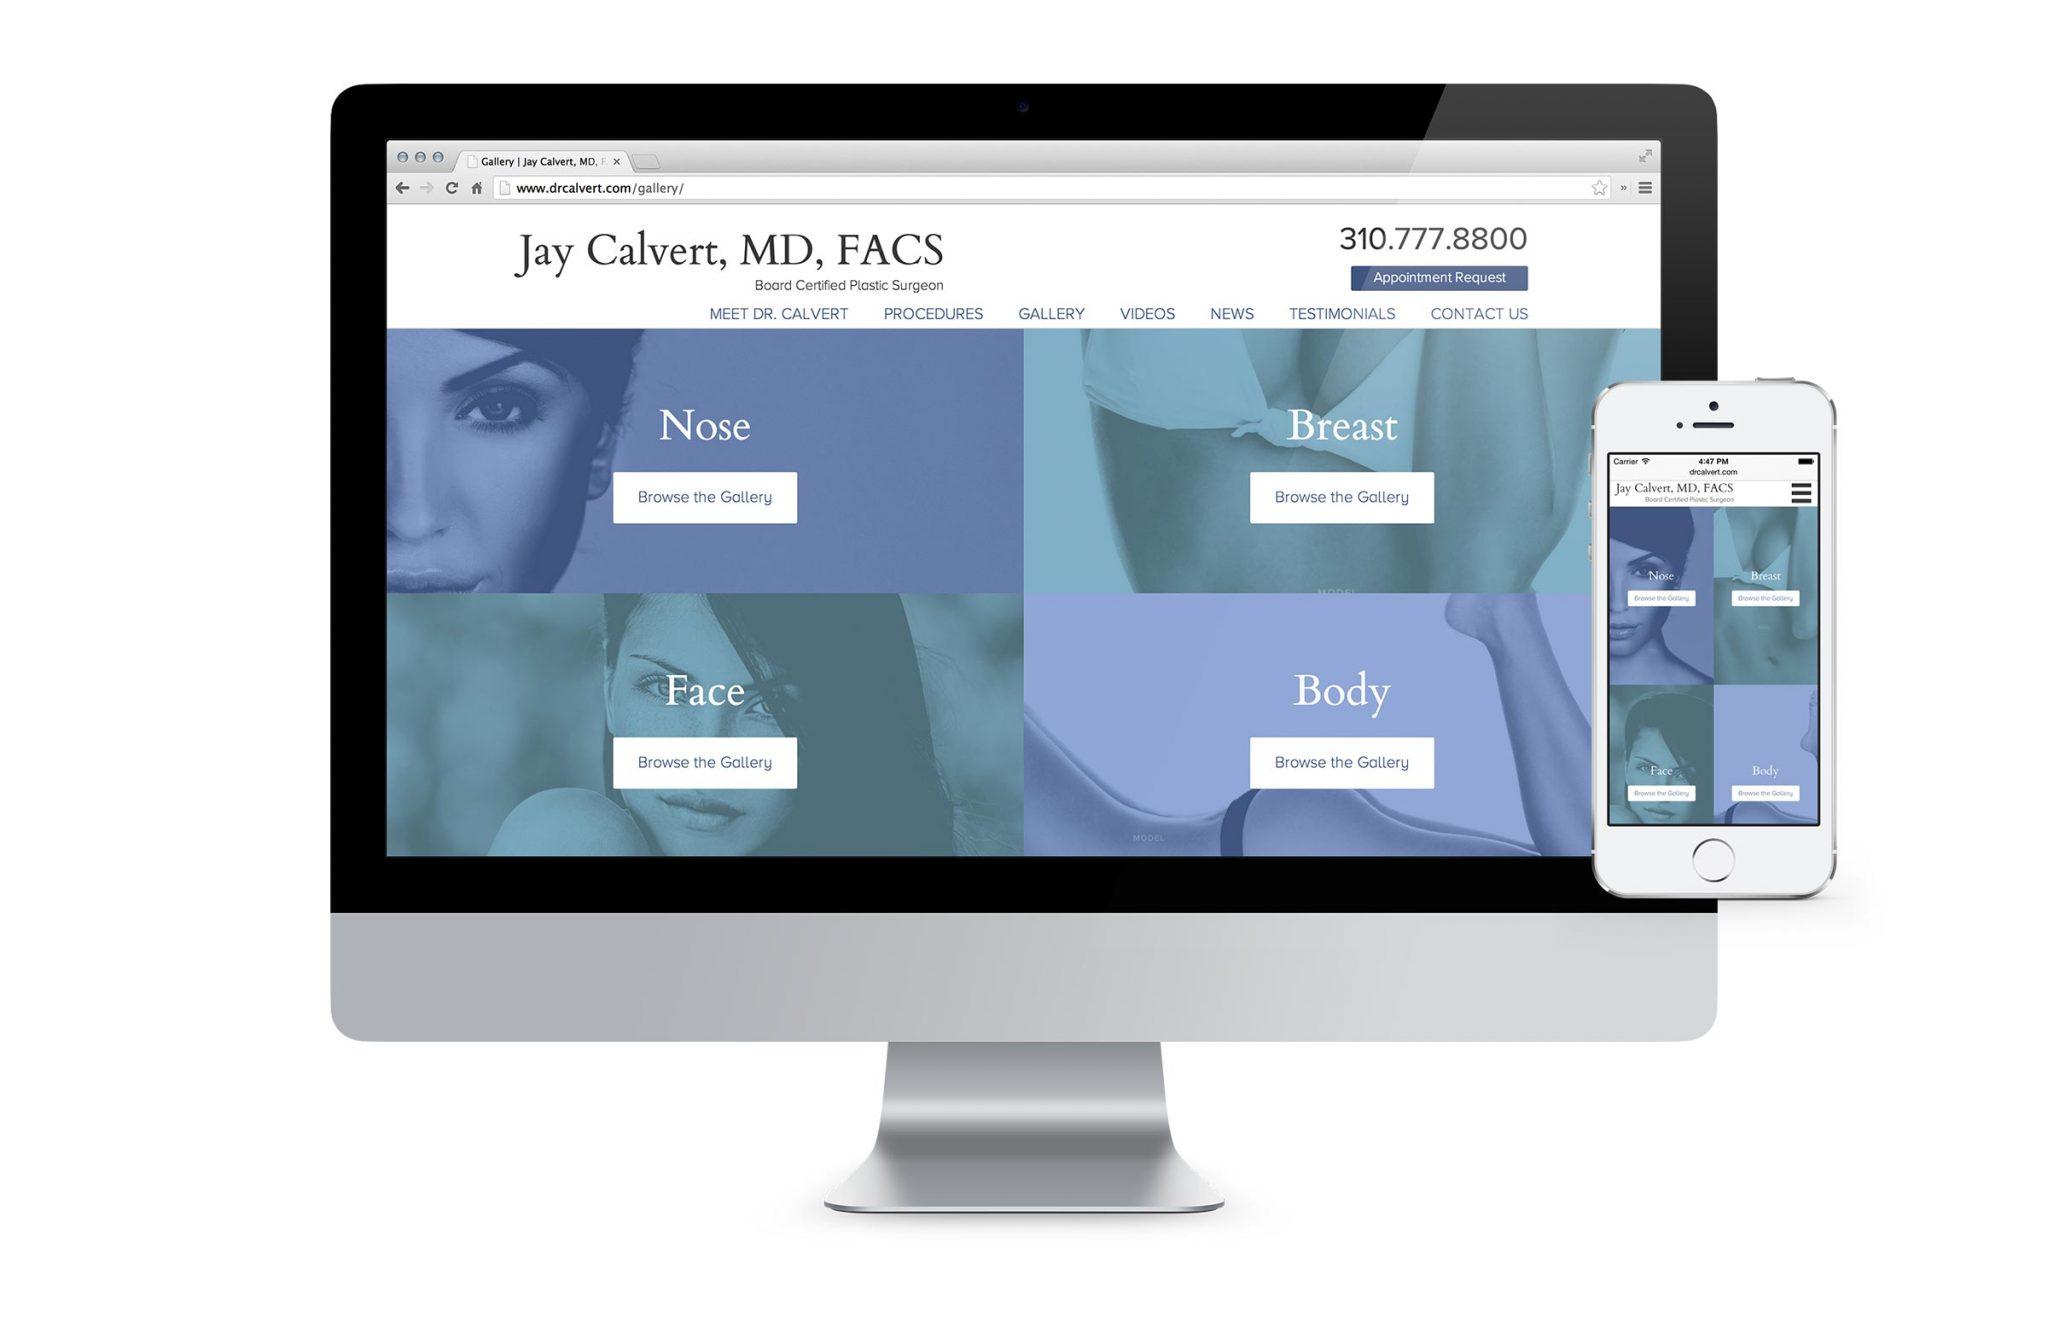 jay calvert md facs web development isimplifyme gallery